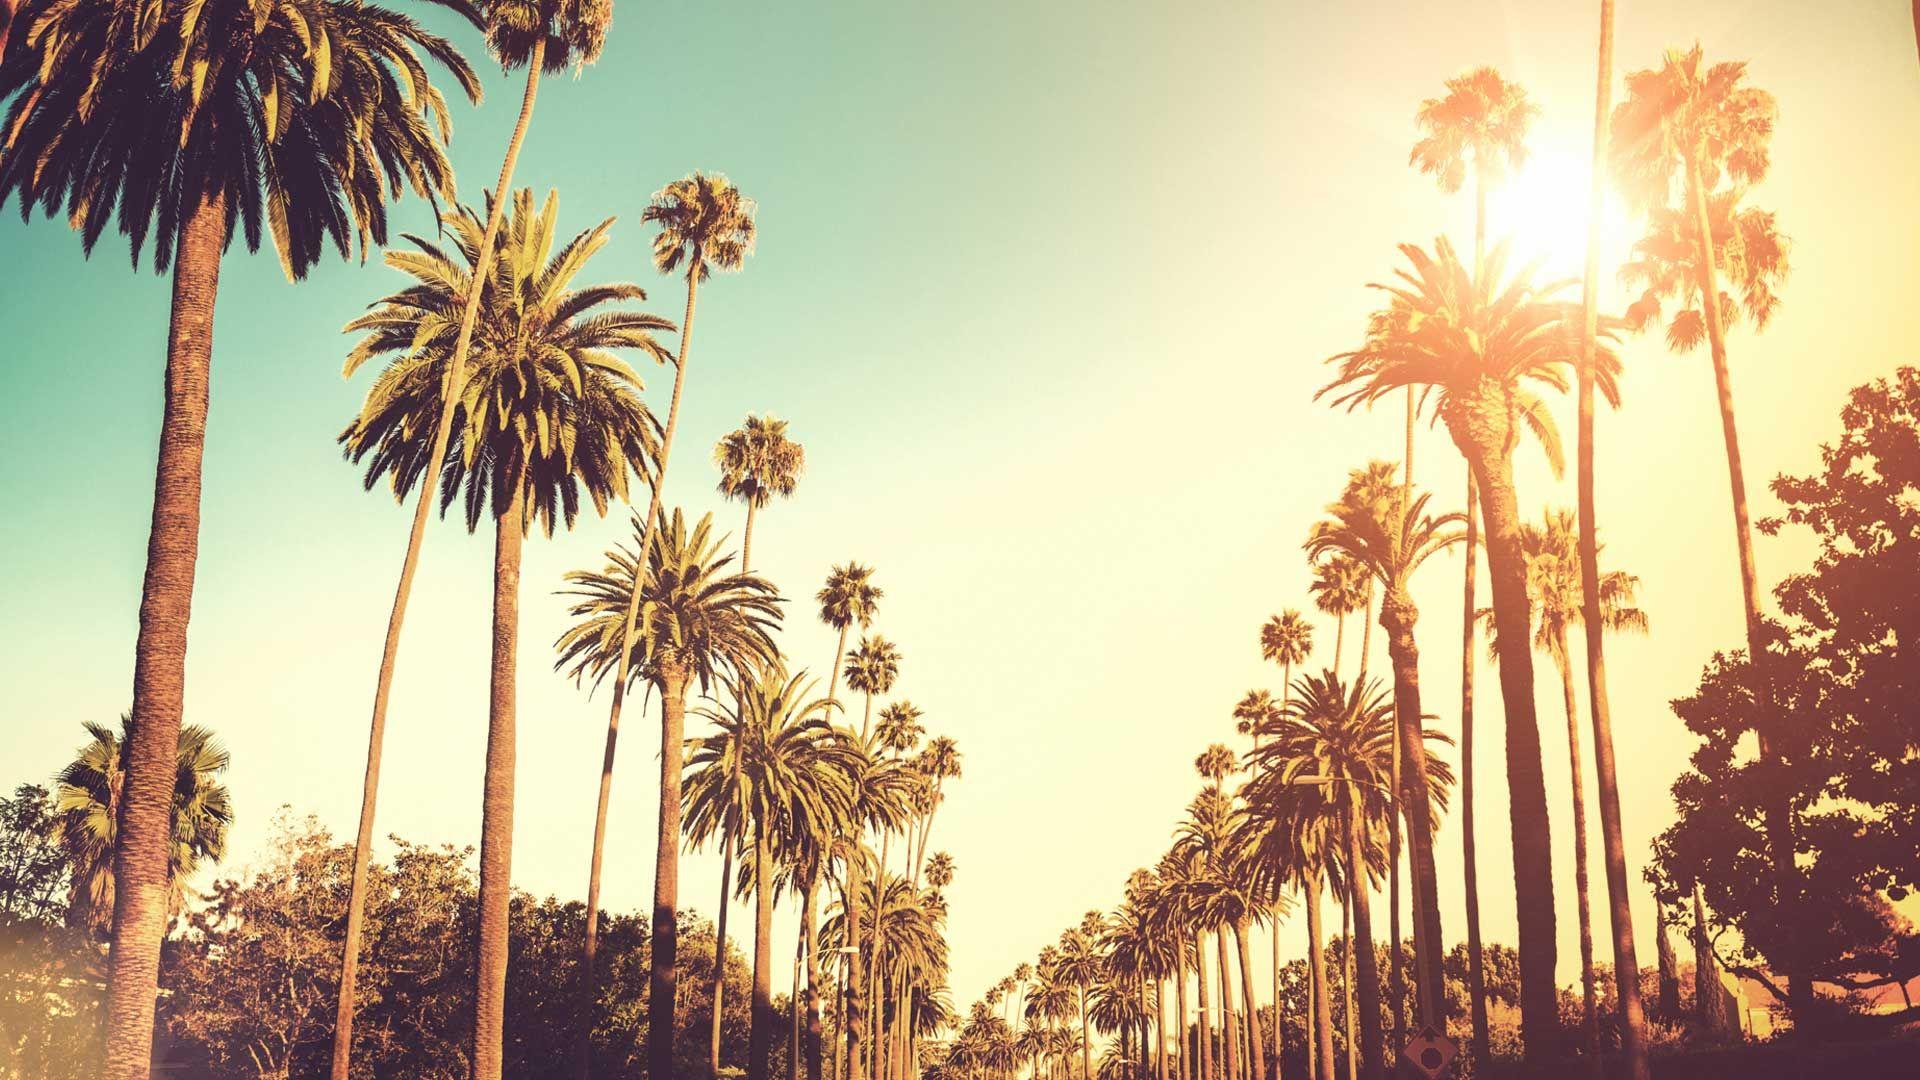 Beverly Hills Download Wallpaper